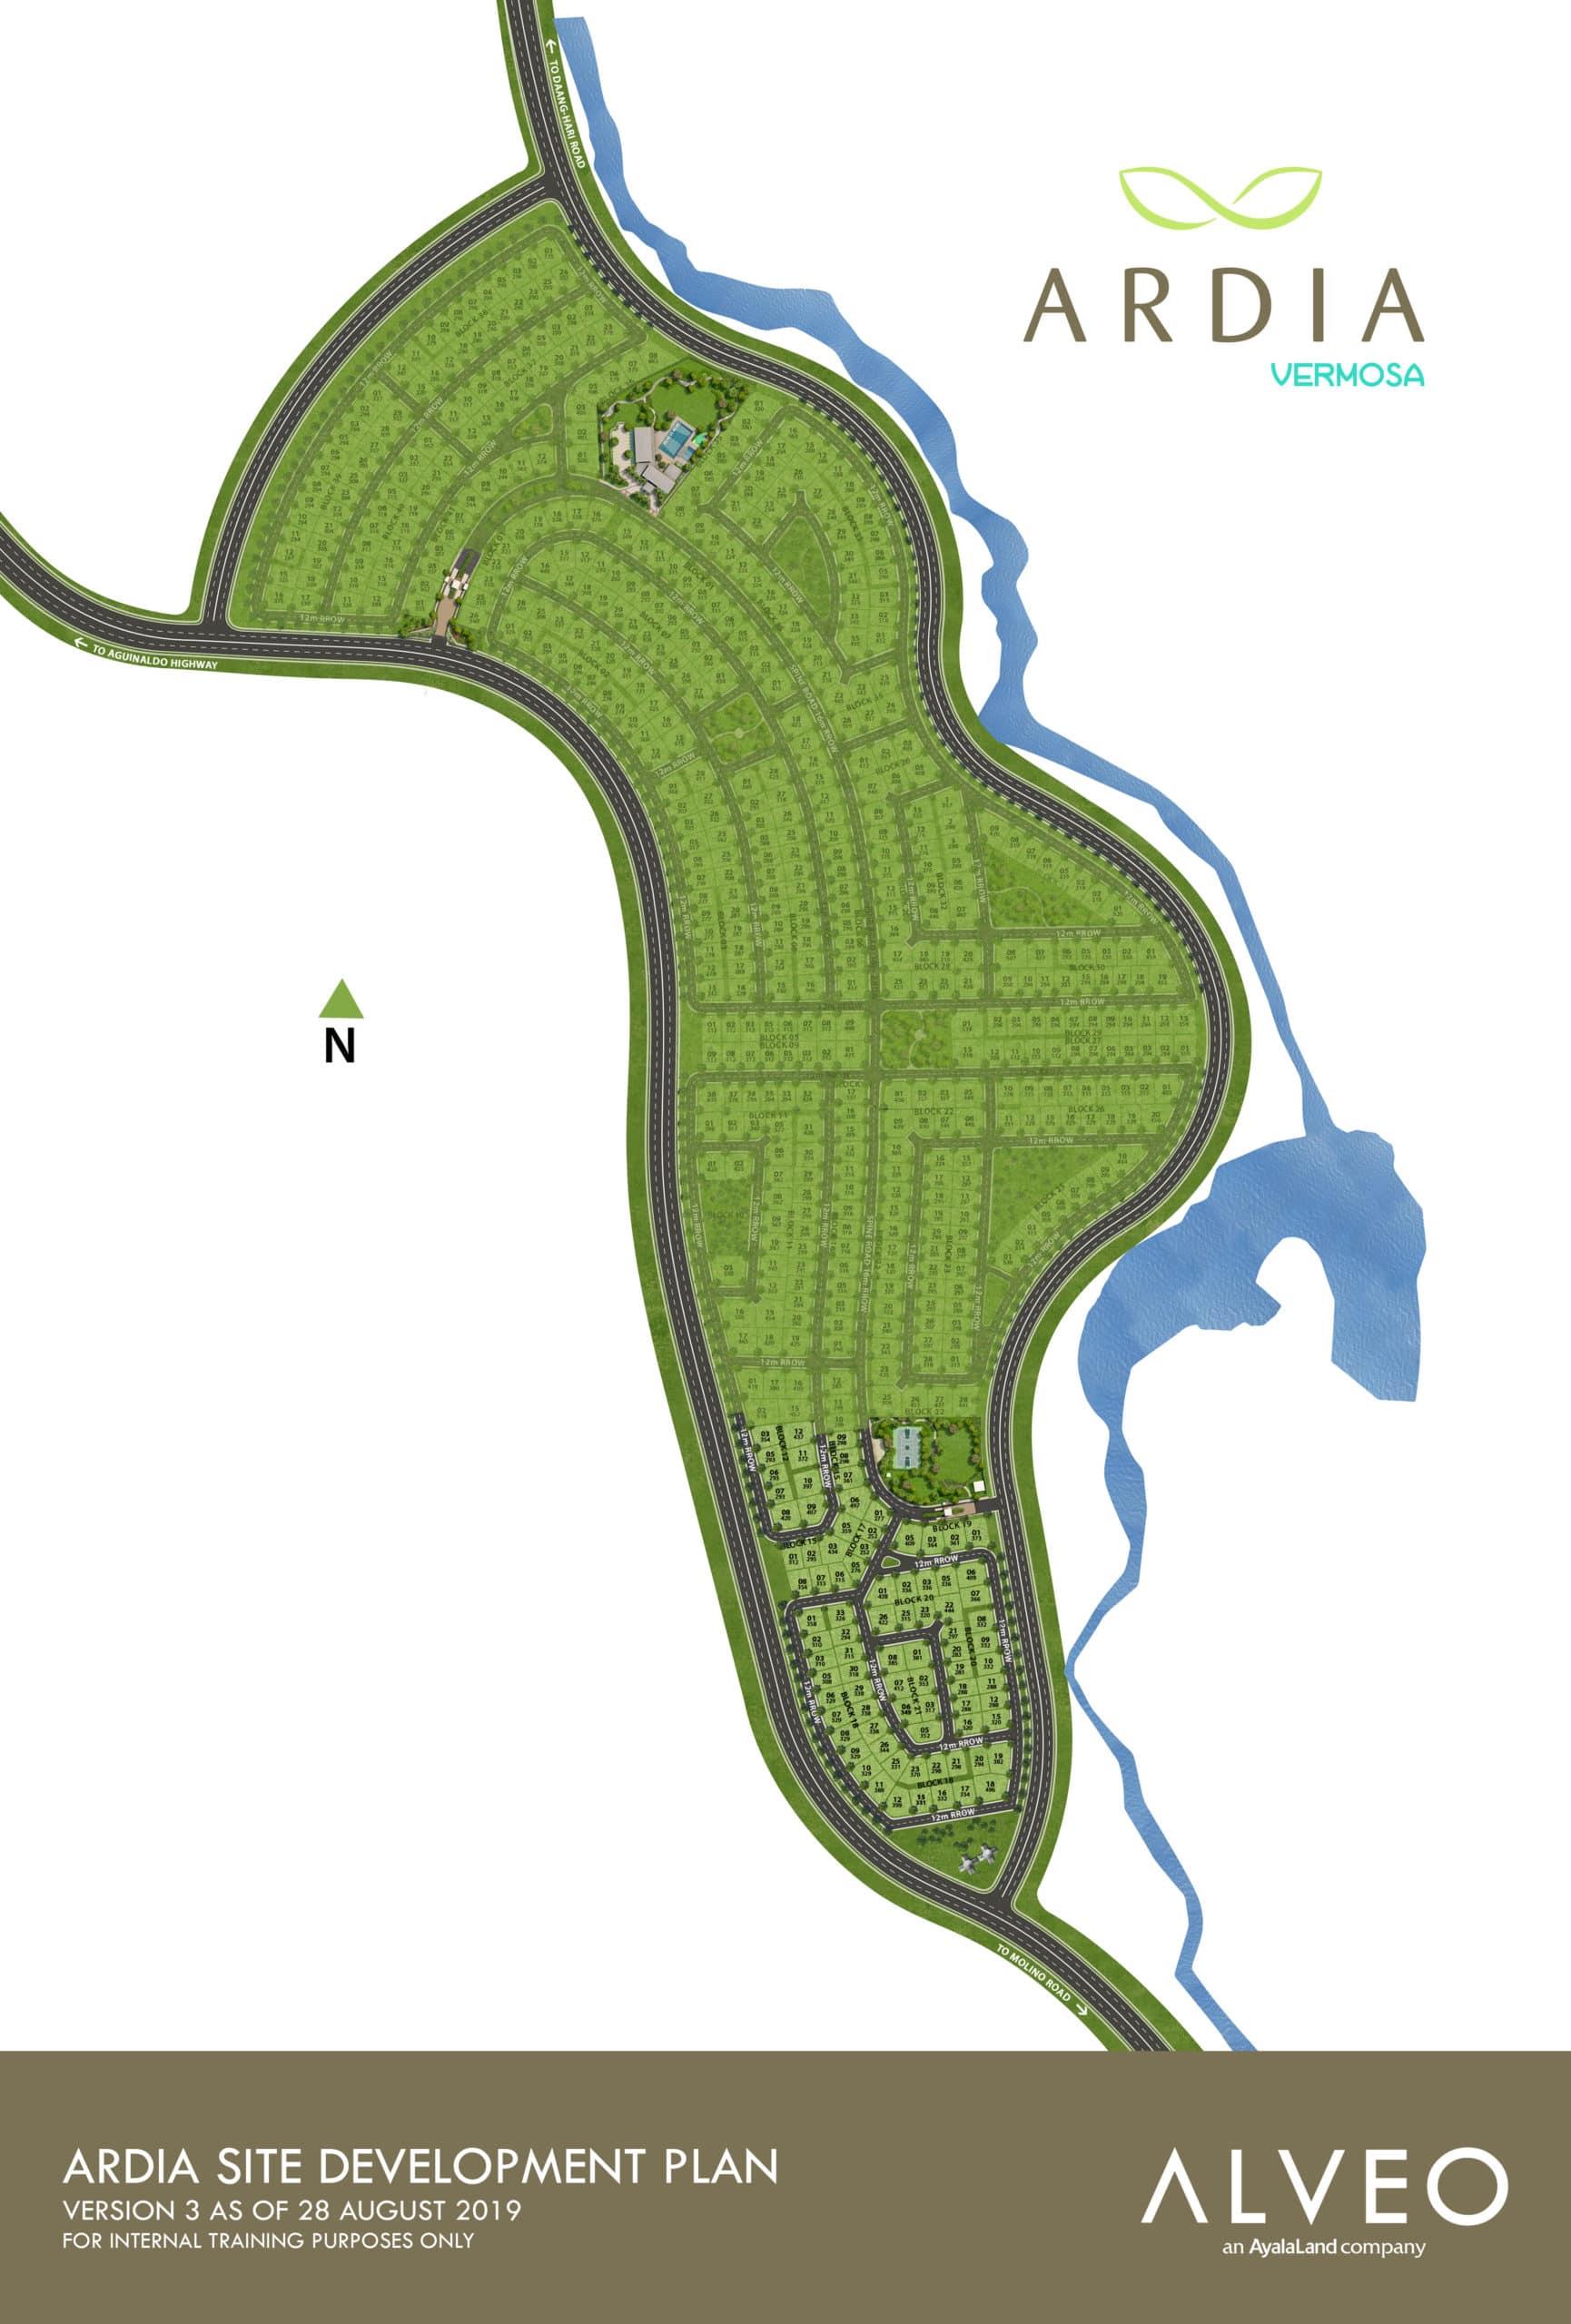 Ardia Site Development Plan